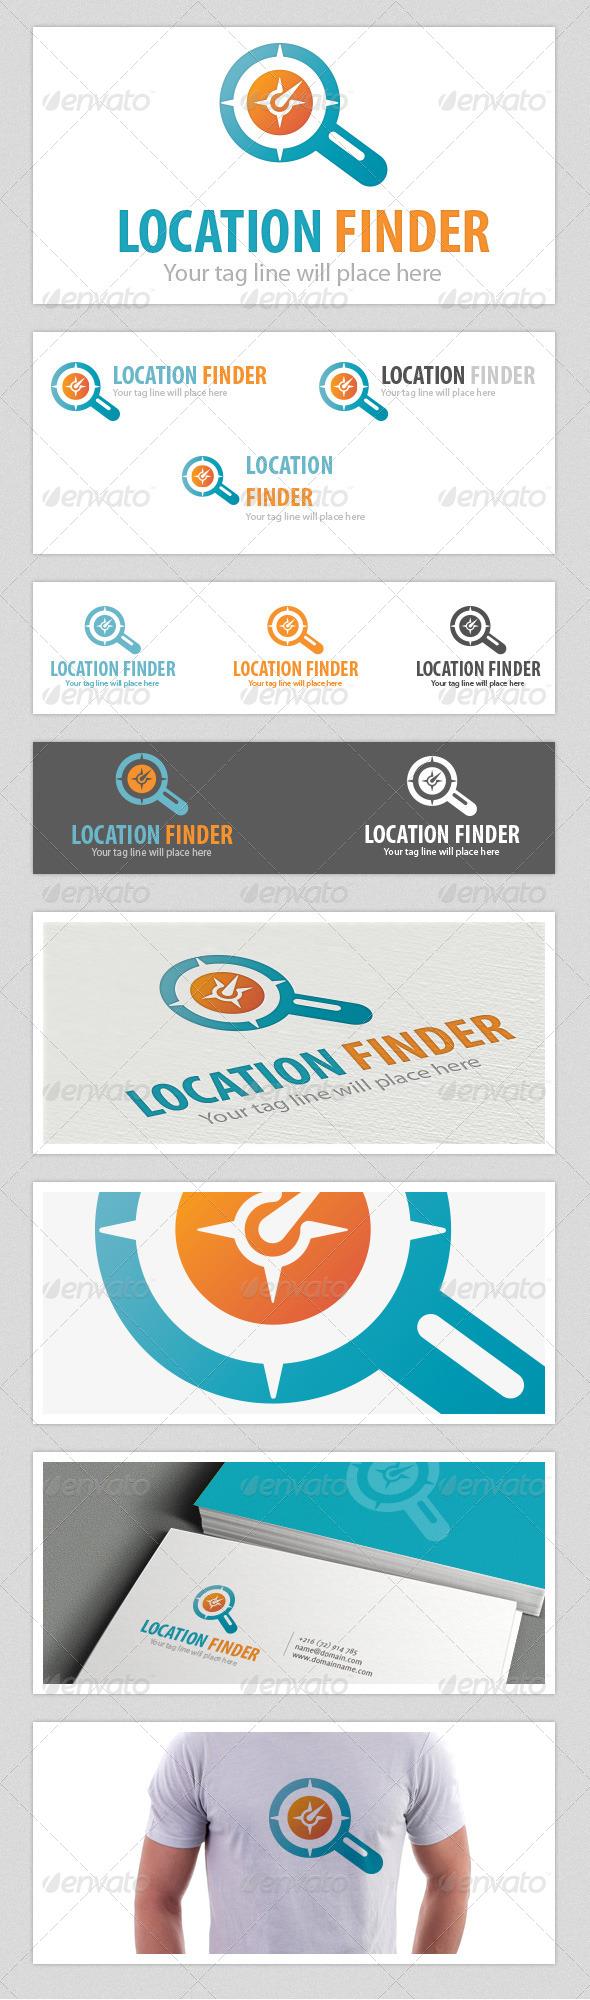 GraphicRiver Location Finder Logo 4541458